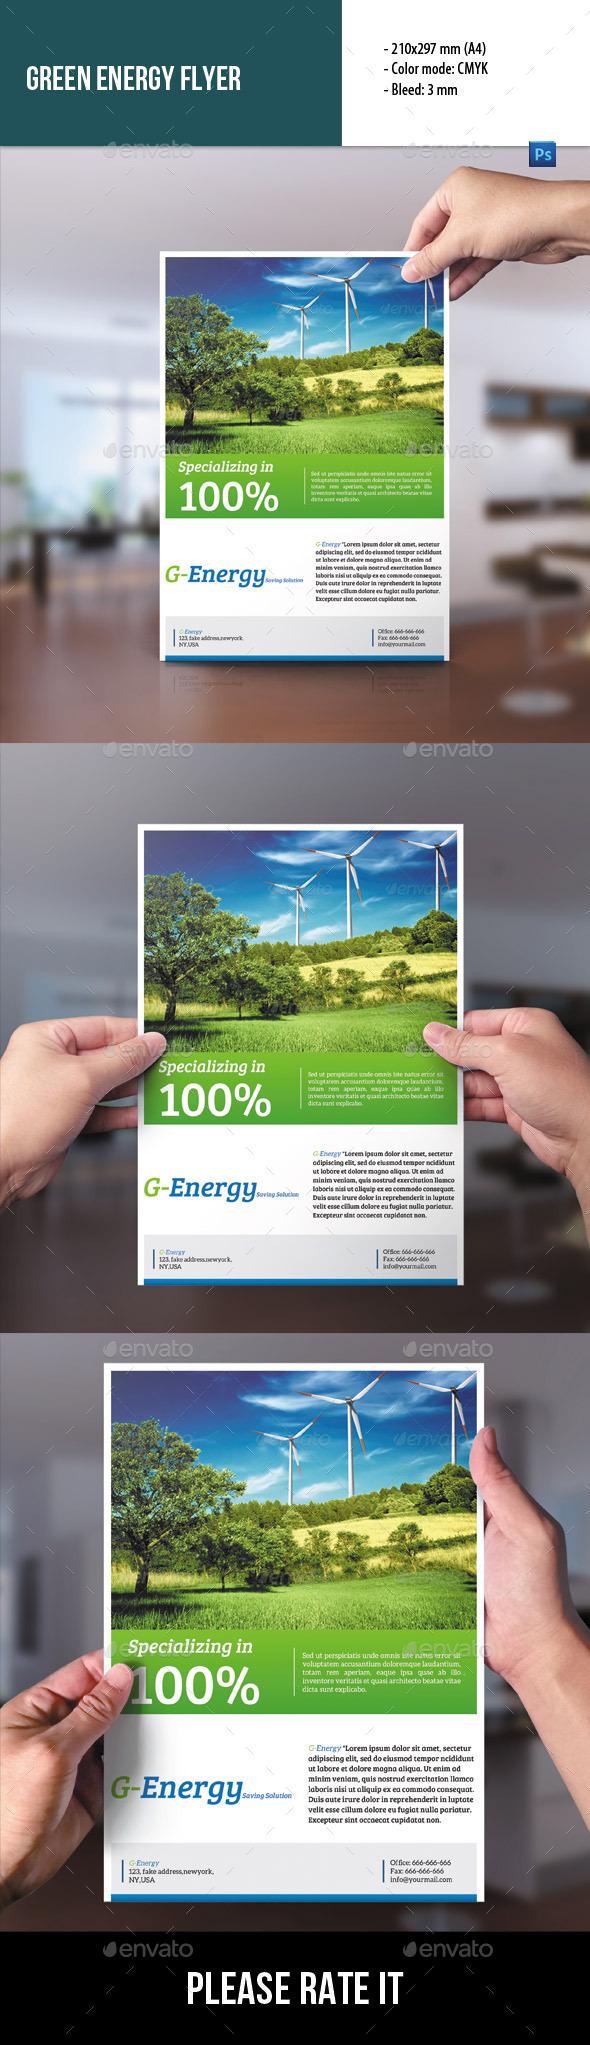 Green Energy Flyer - Corporate Flyers